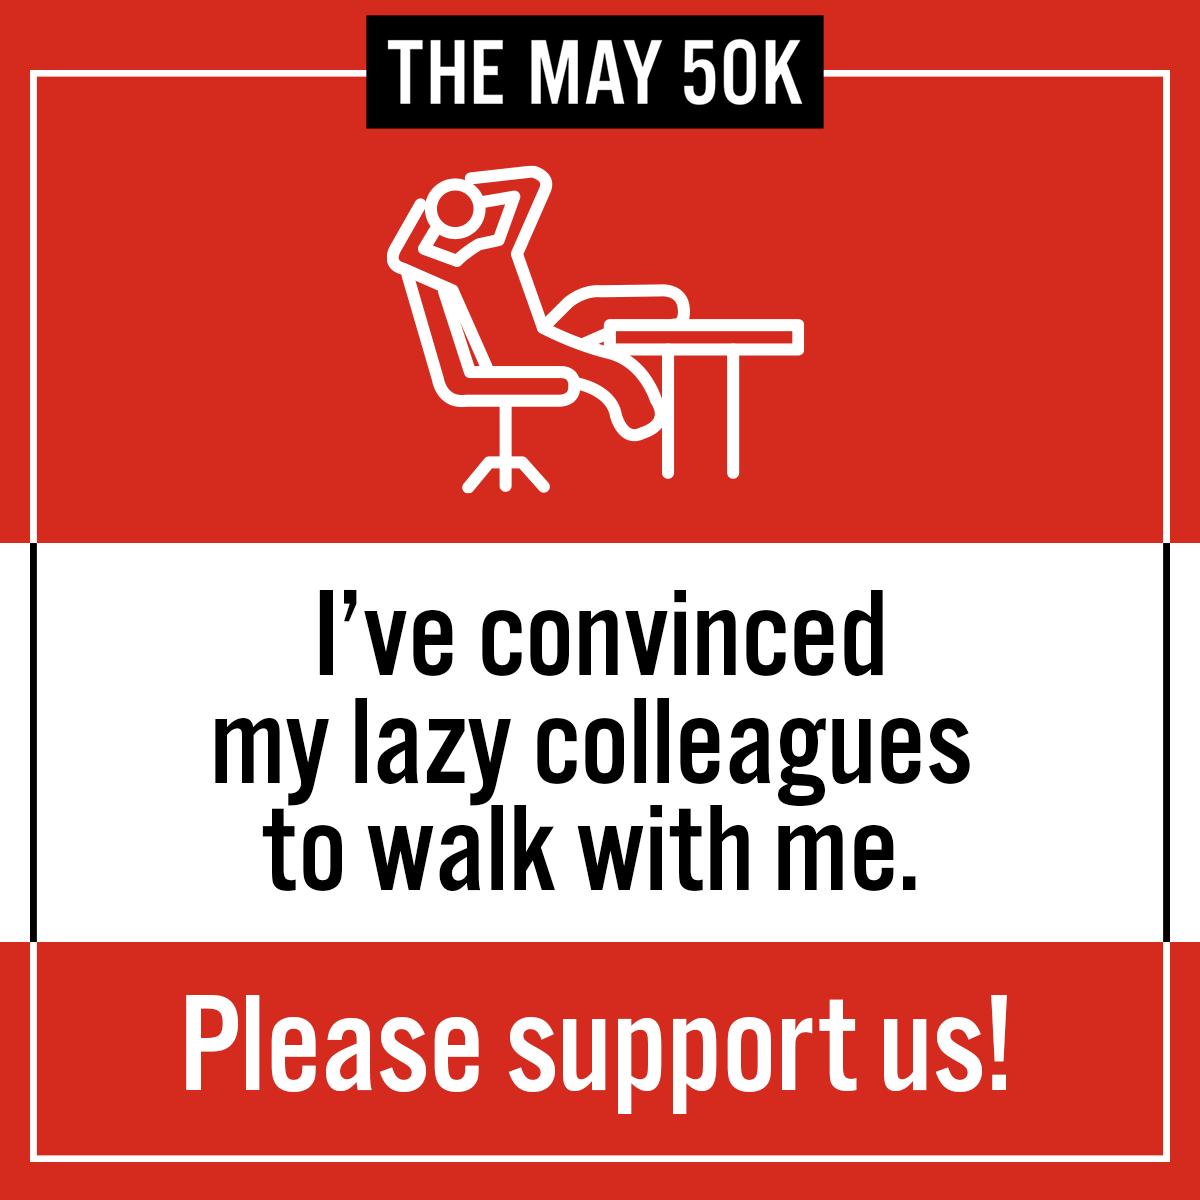 Workplace Social Post - Walk